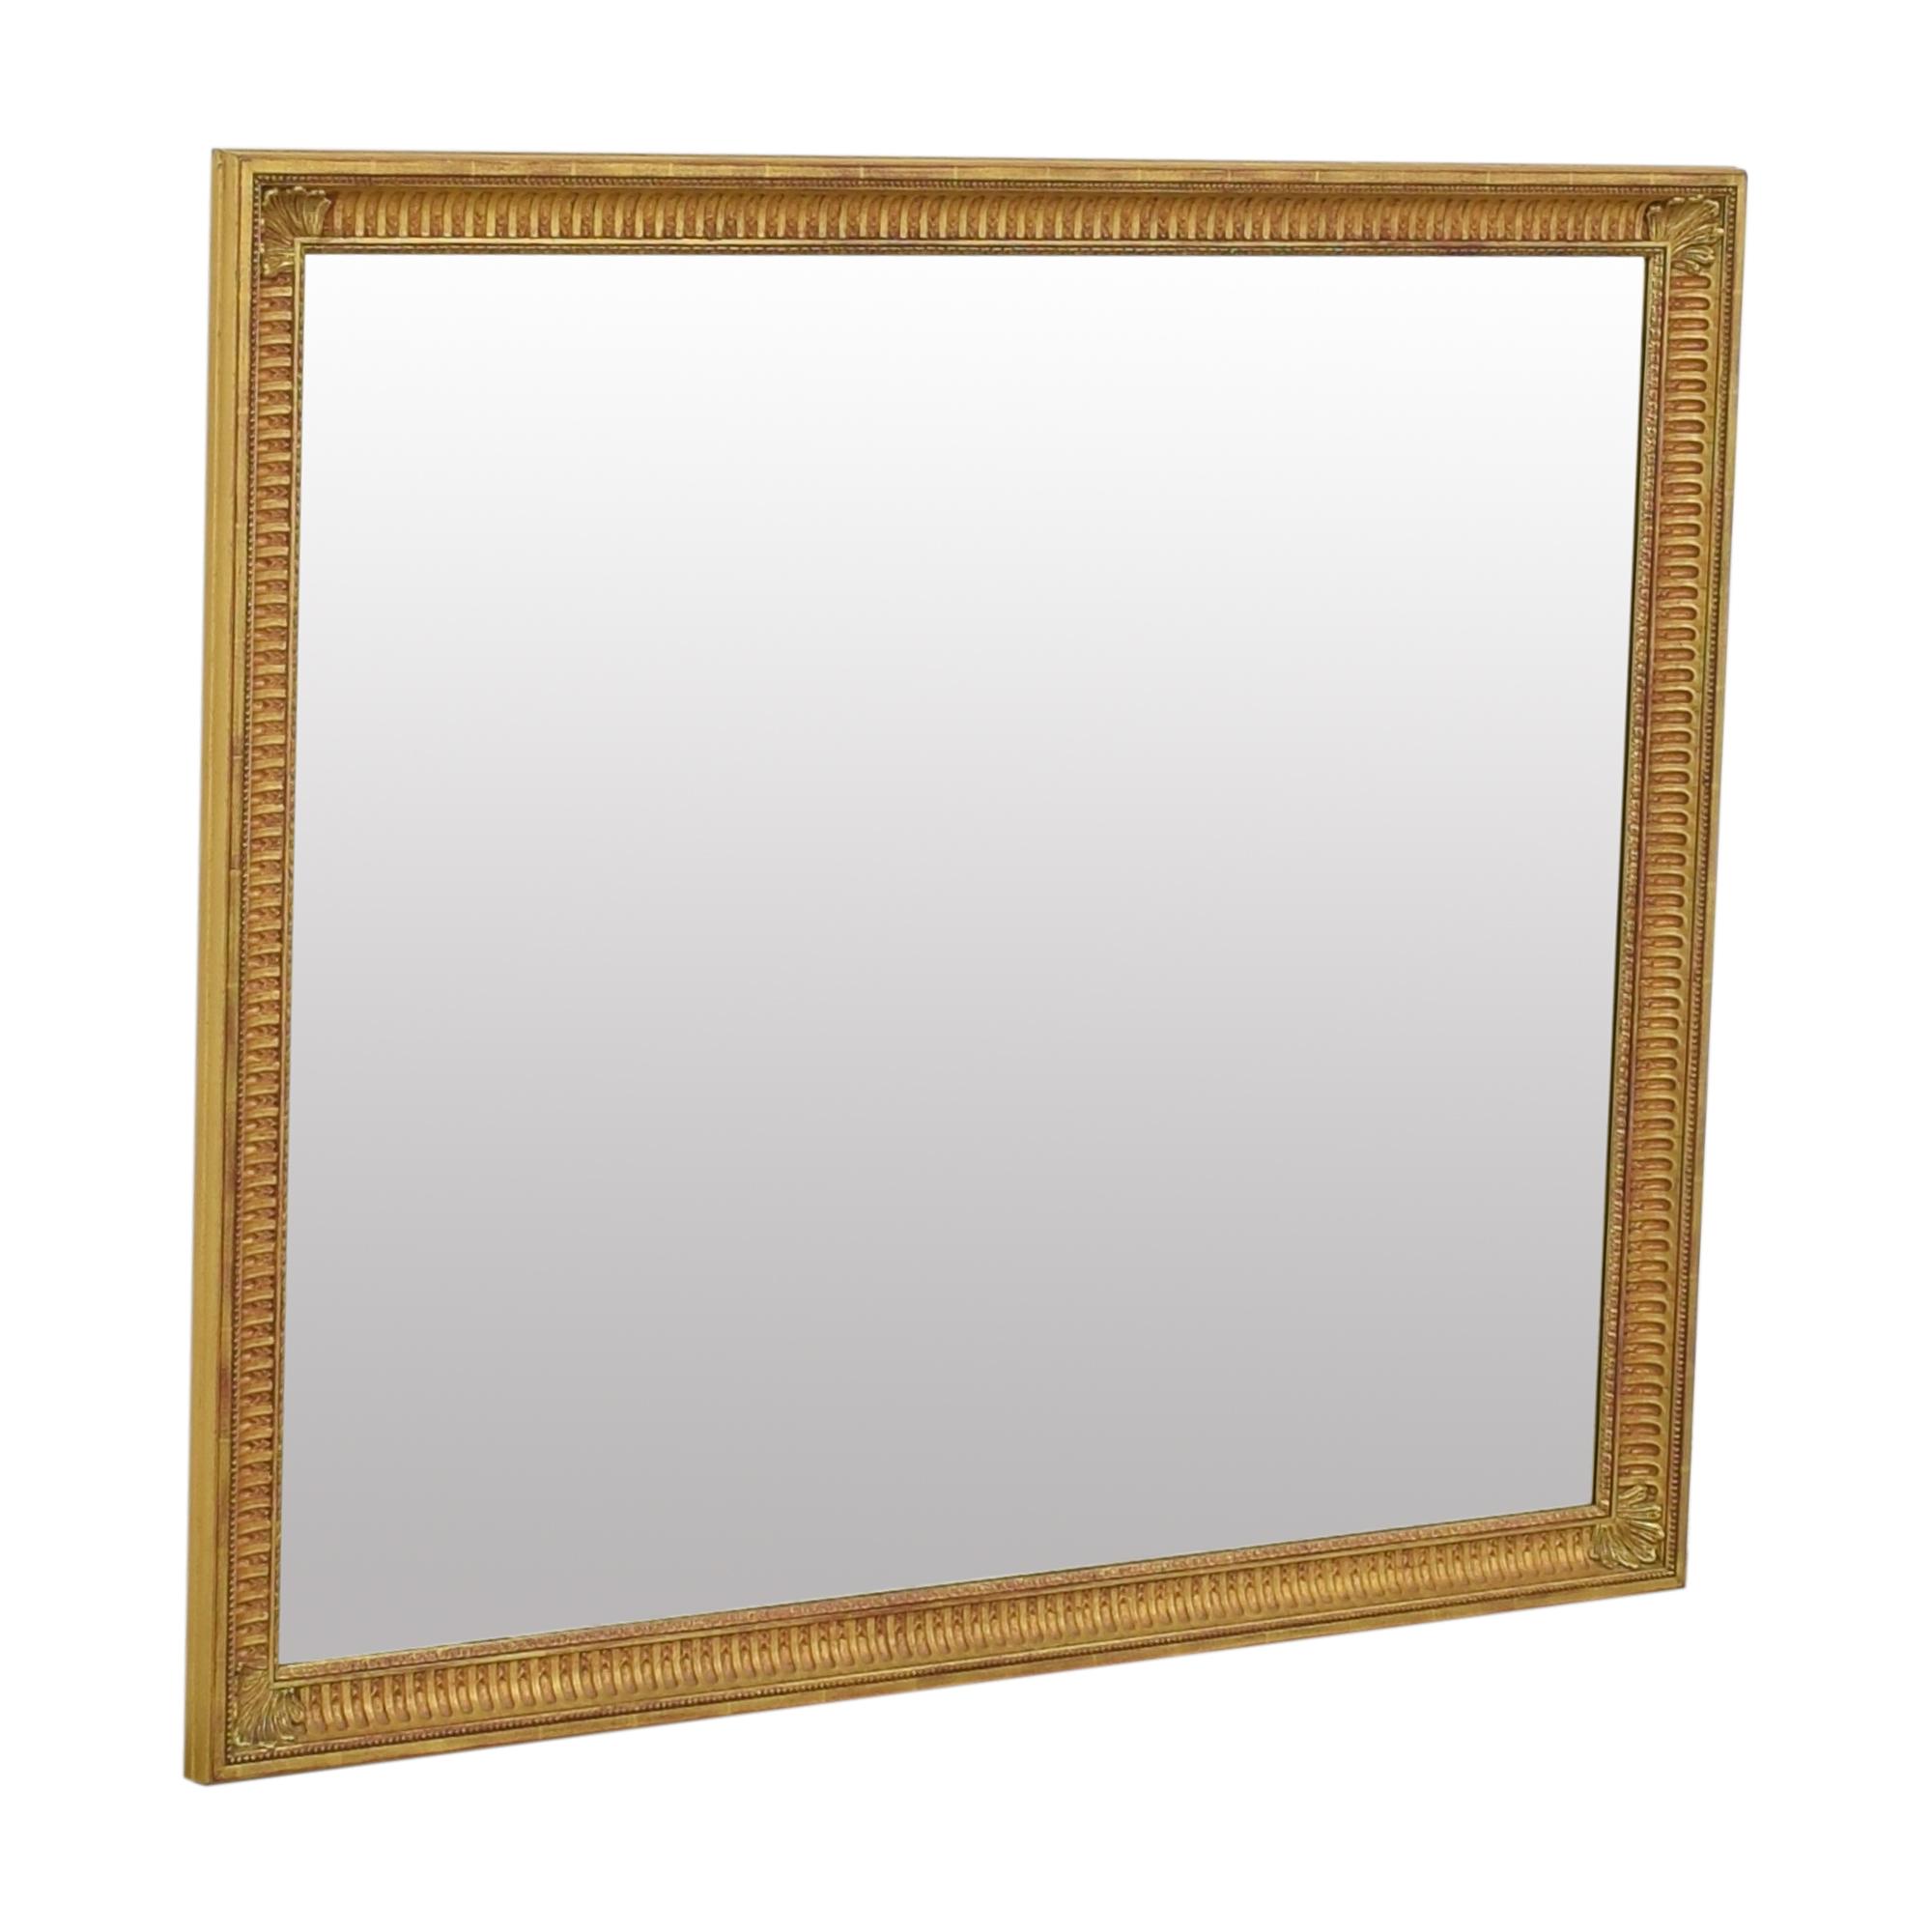 Framed Decorative Wall Mirror price